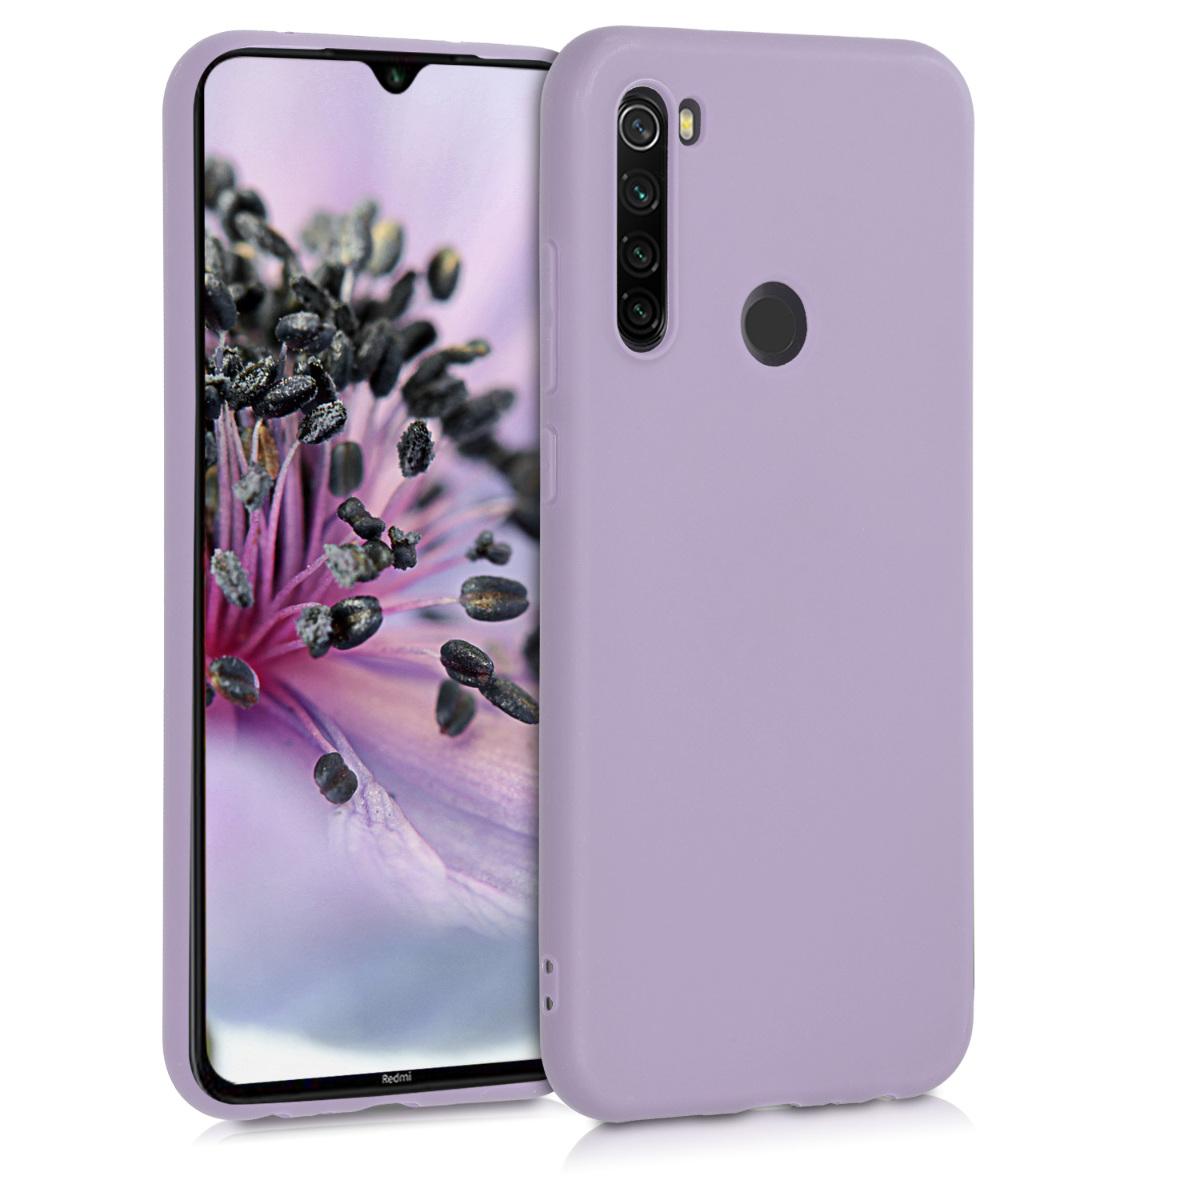 KW Θήκη Σιλικόνης Xiaomi Redmi Note 8T - Lavender (50956.108)